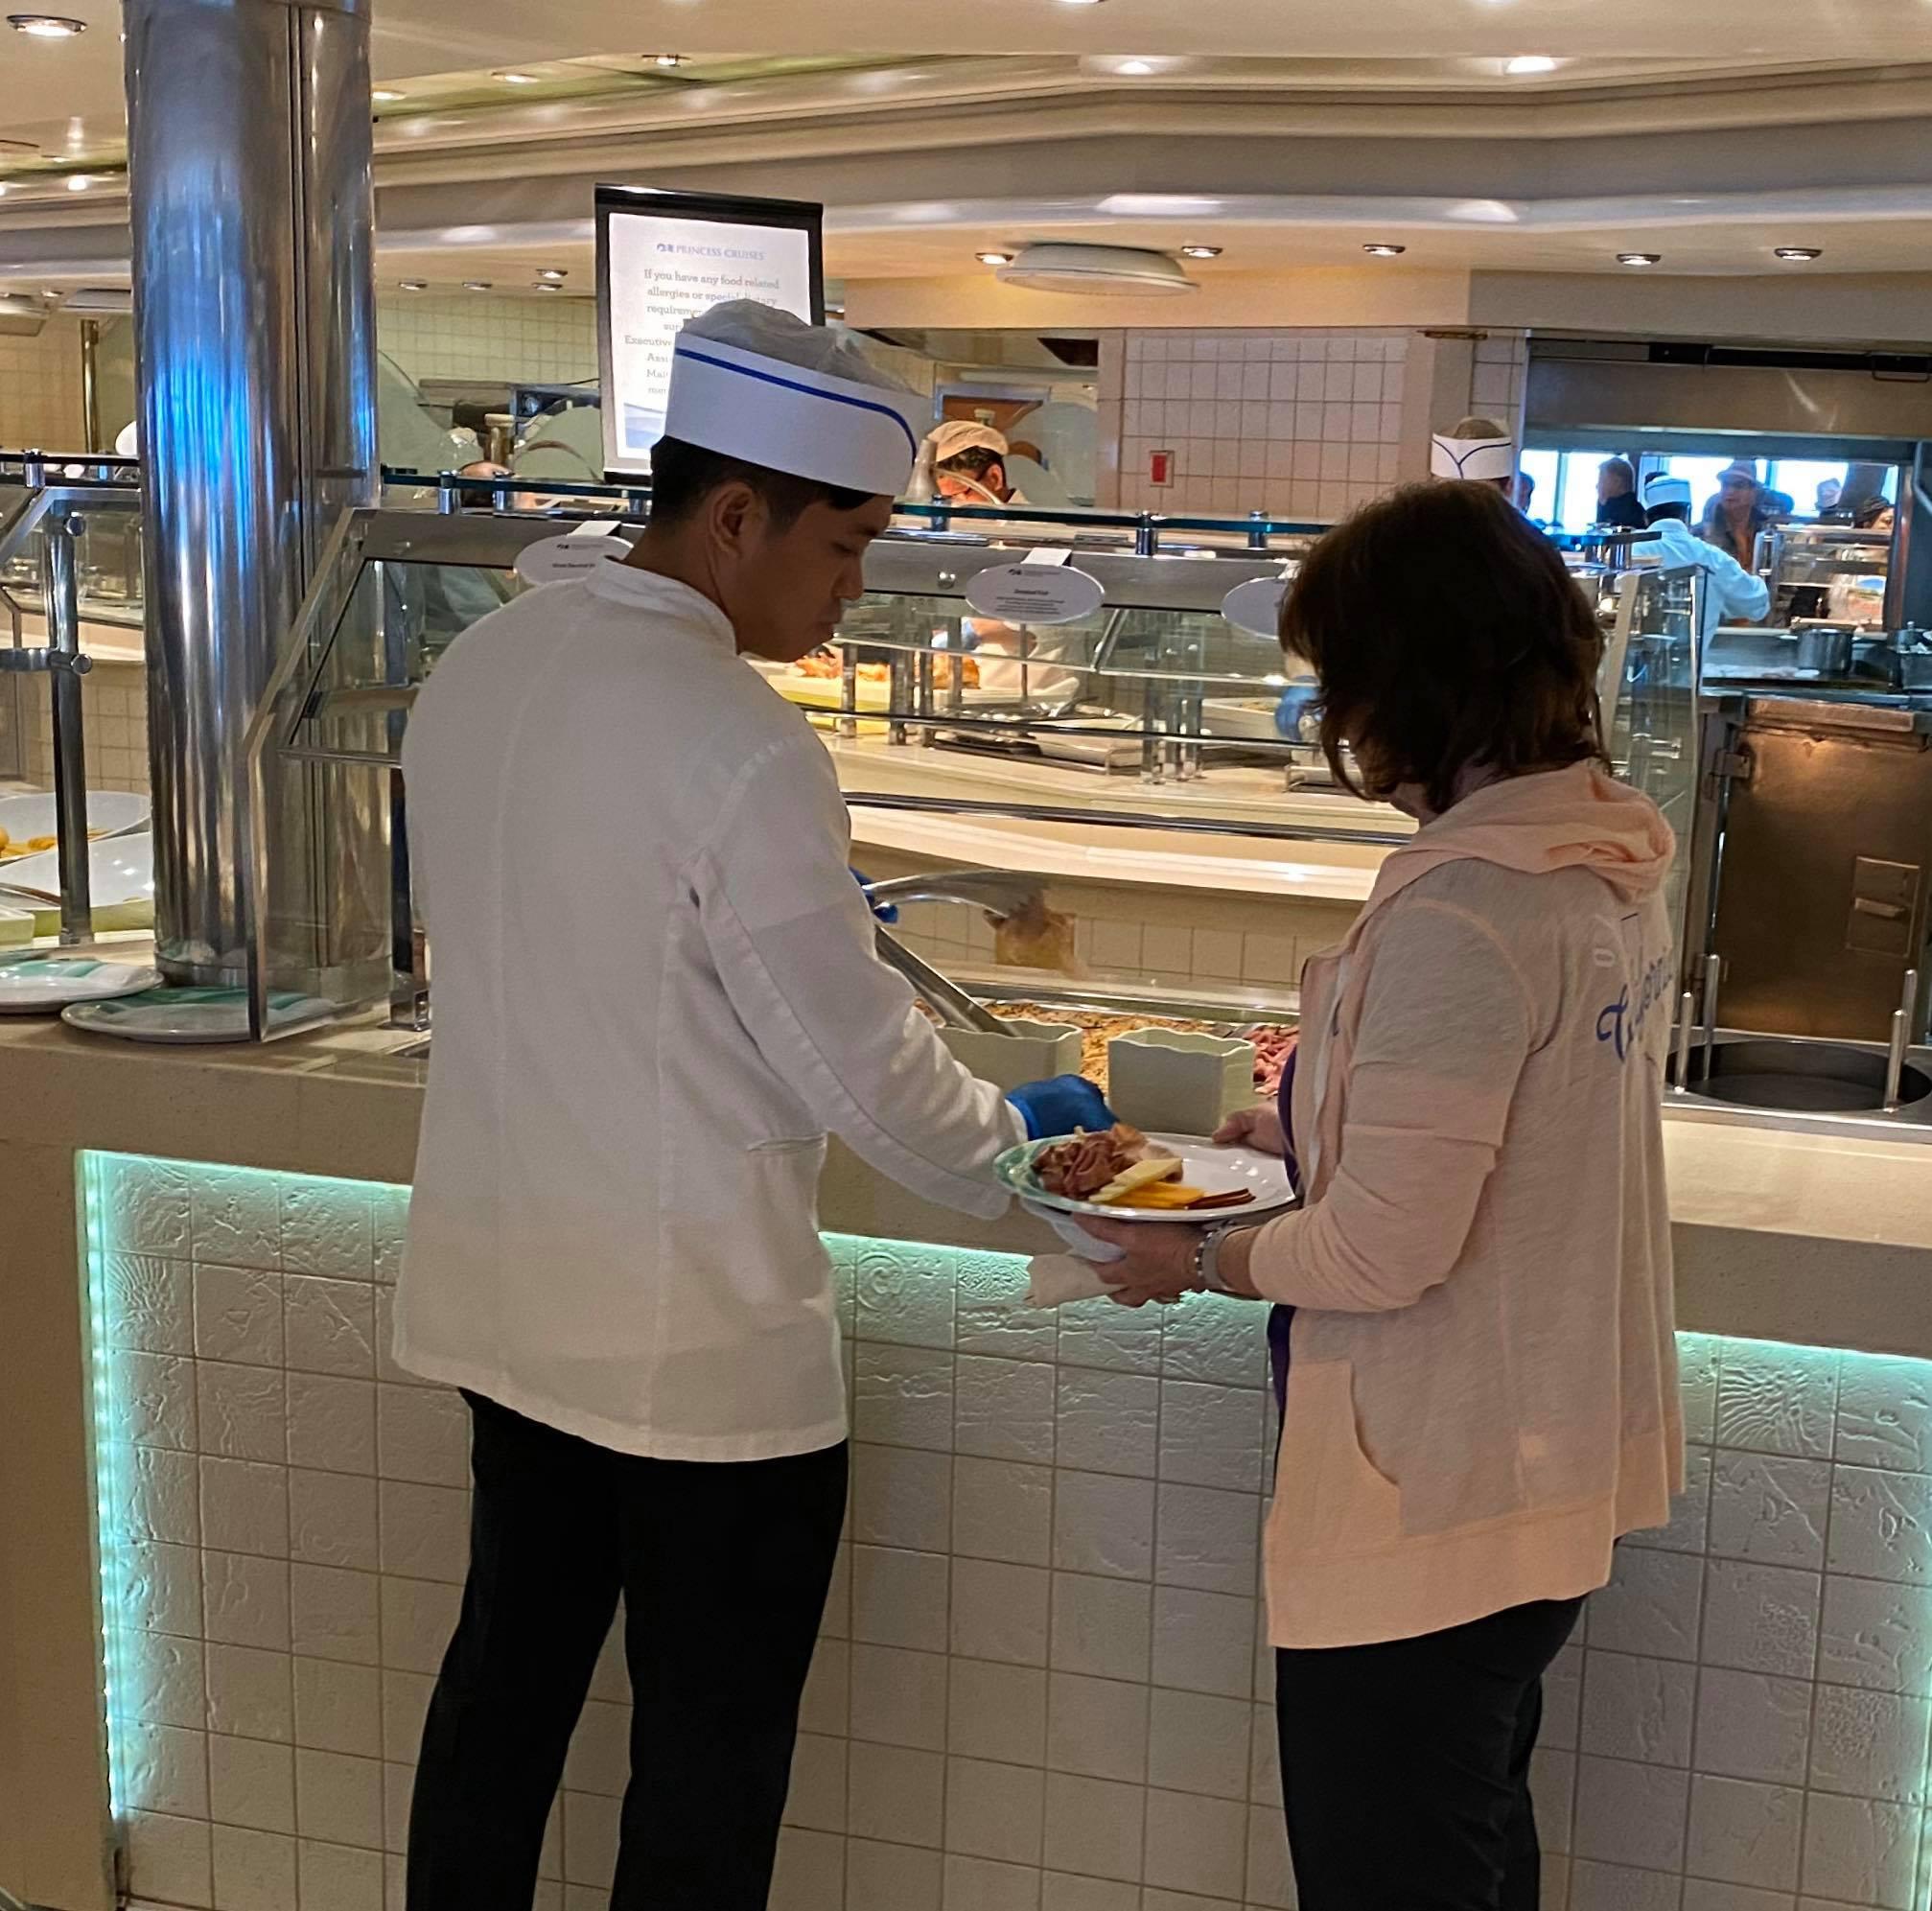 A crew member serves passenger food at a buffet on Grand Princess on Mar. 5, 2020.